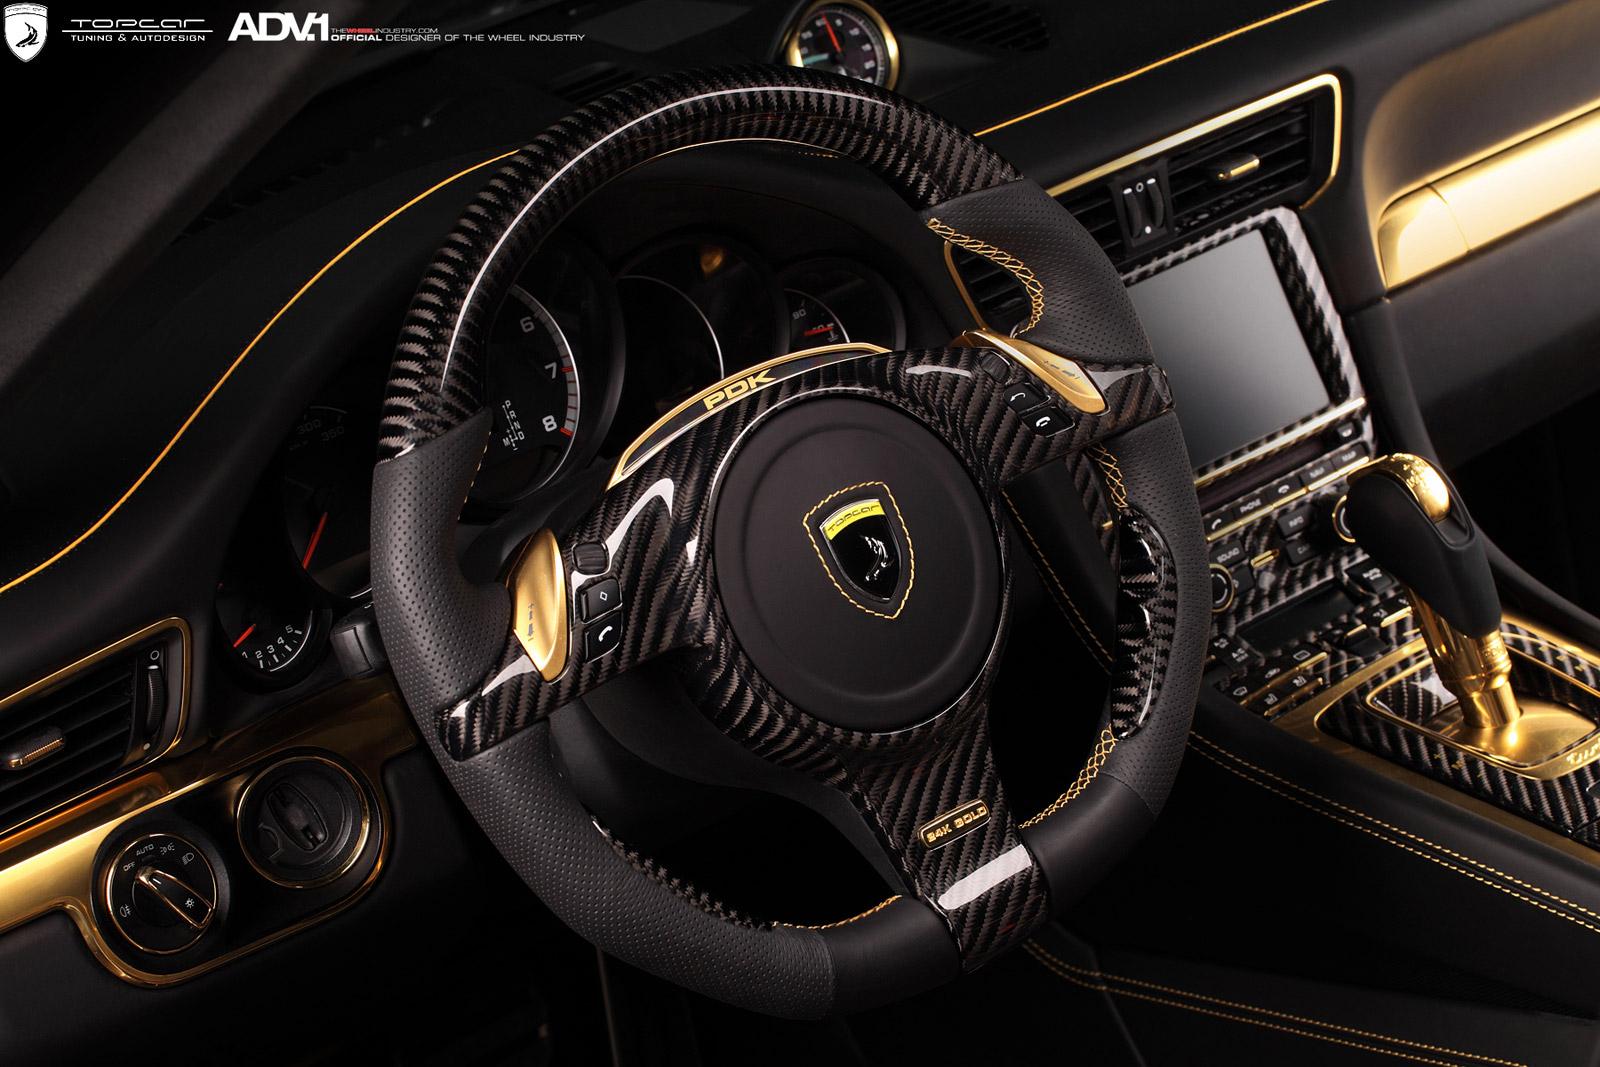 porsche-911-turbo-typ-991-topcar-stinger-gtr-031